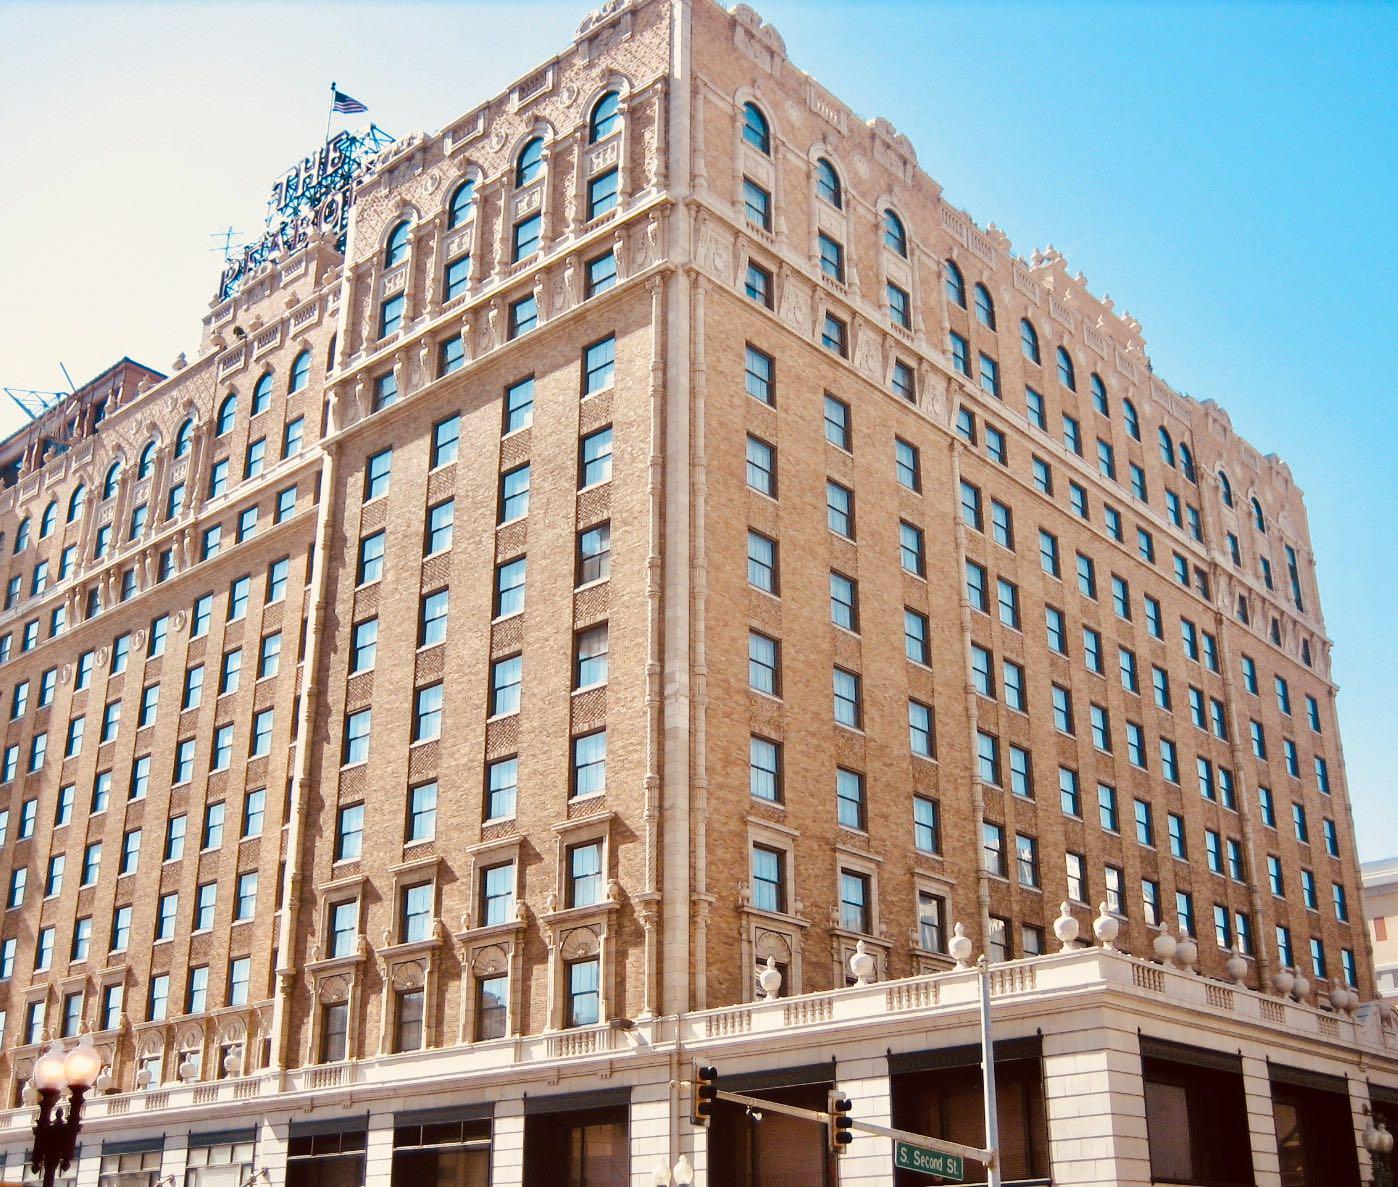 The Peabody Hotel in Memphis.